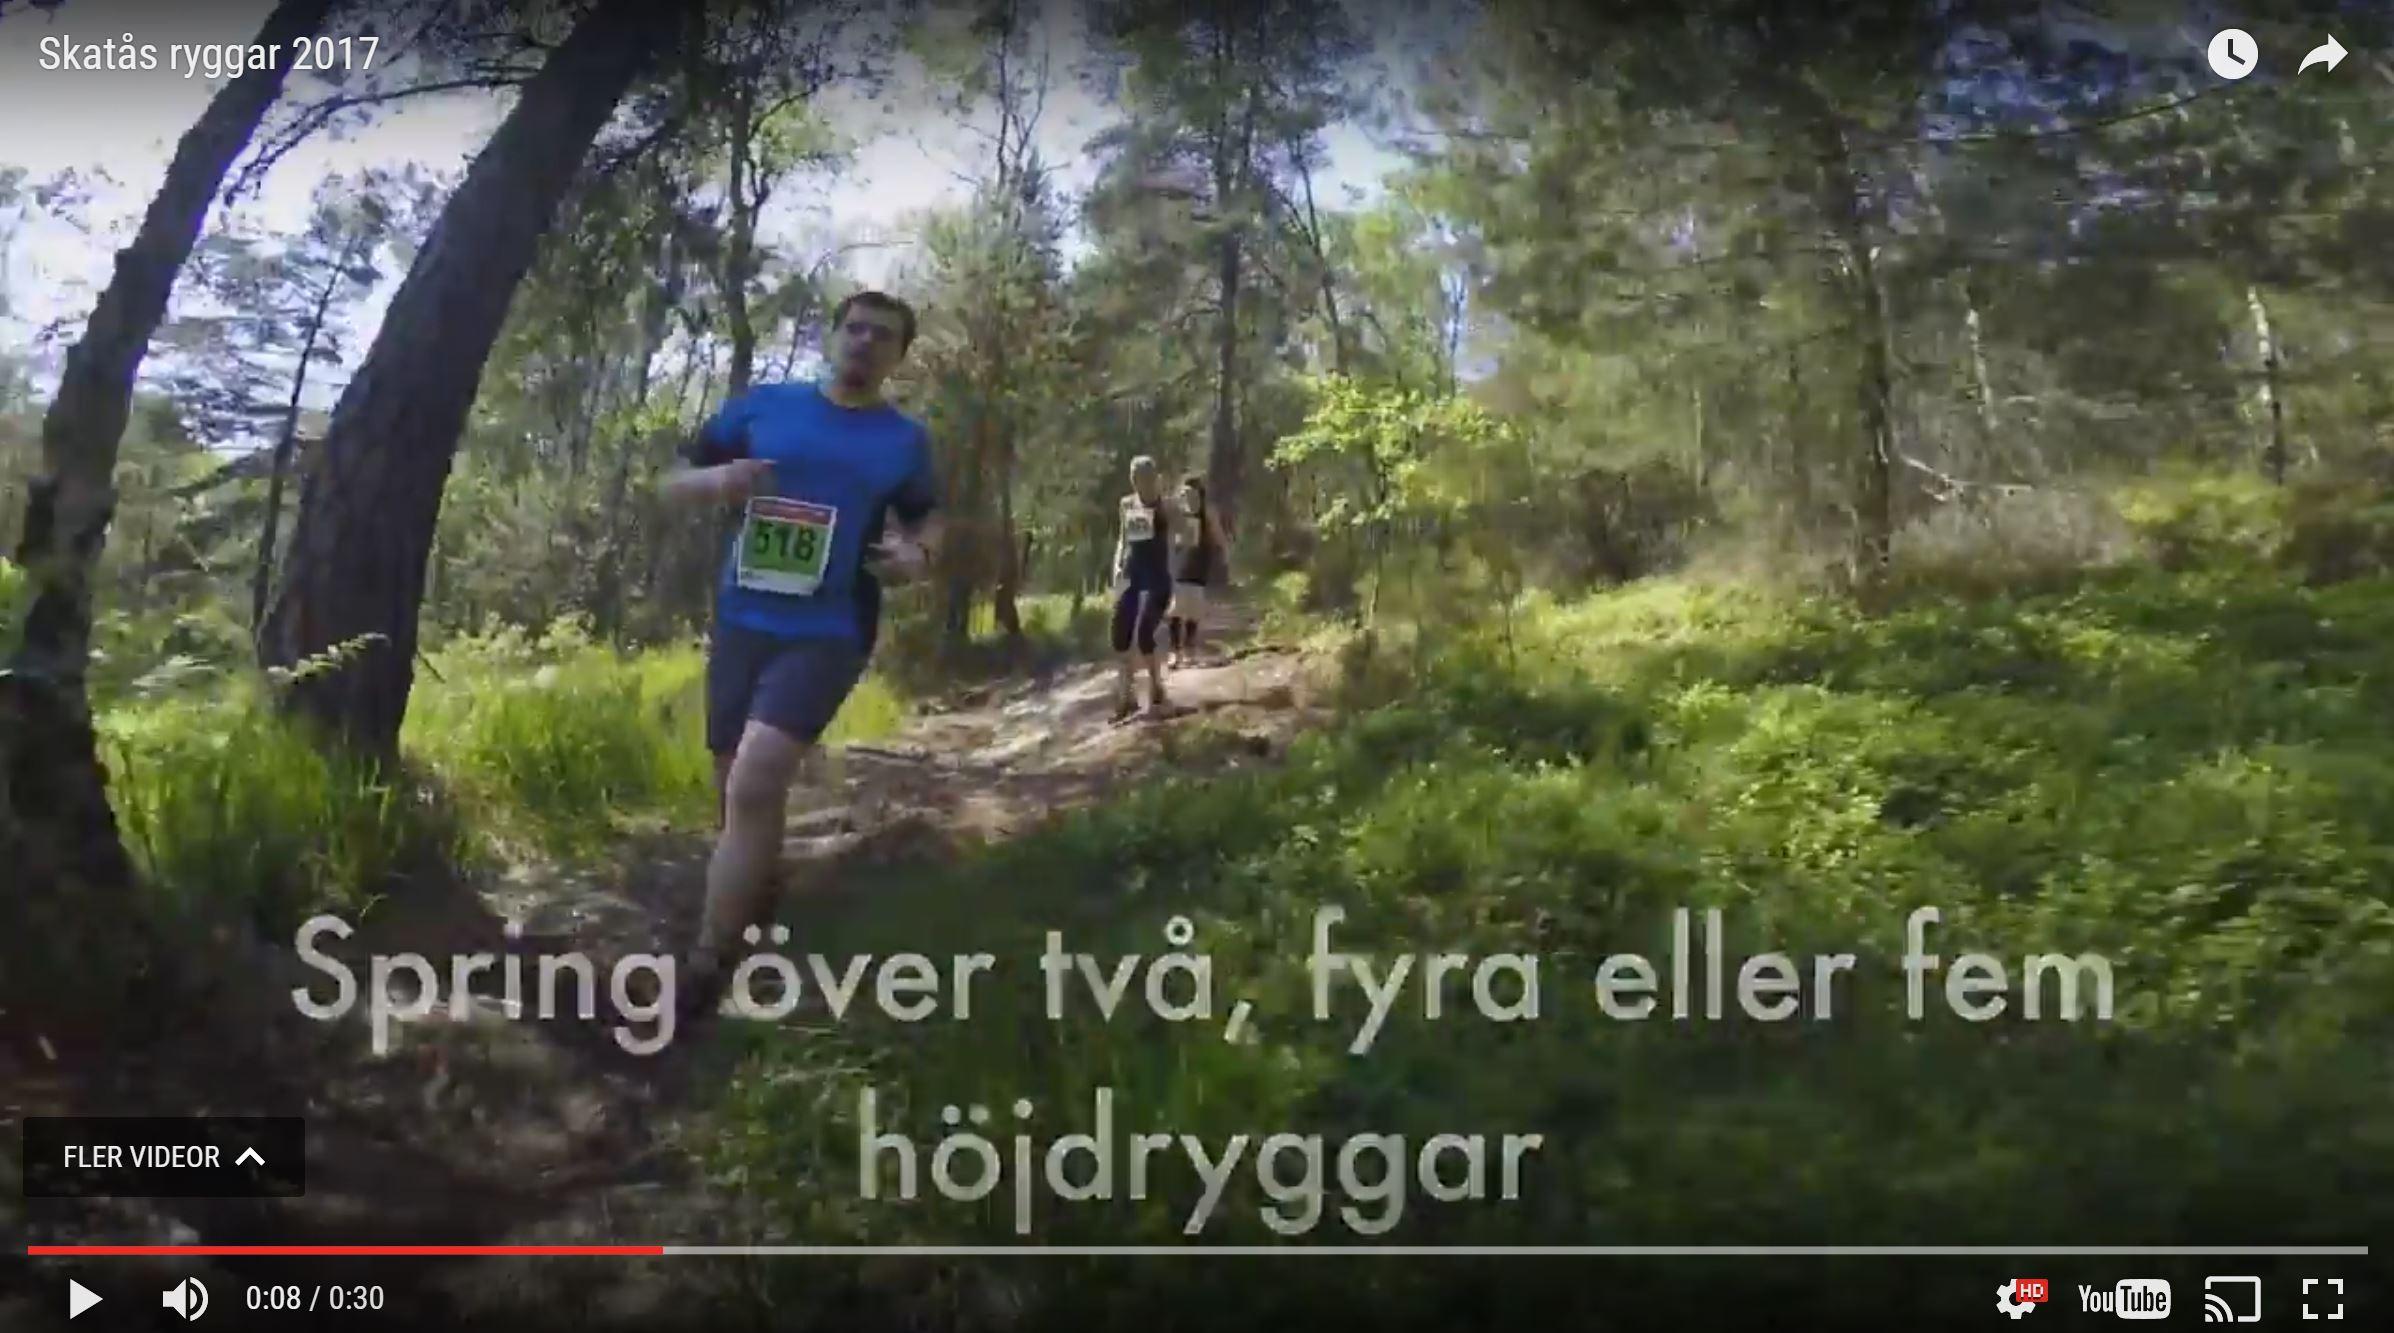 Skatås ryggar 2017 film